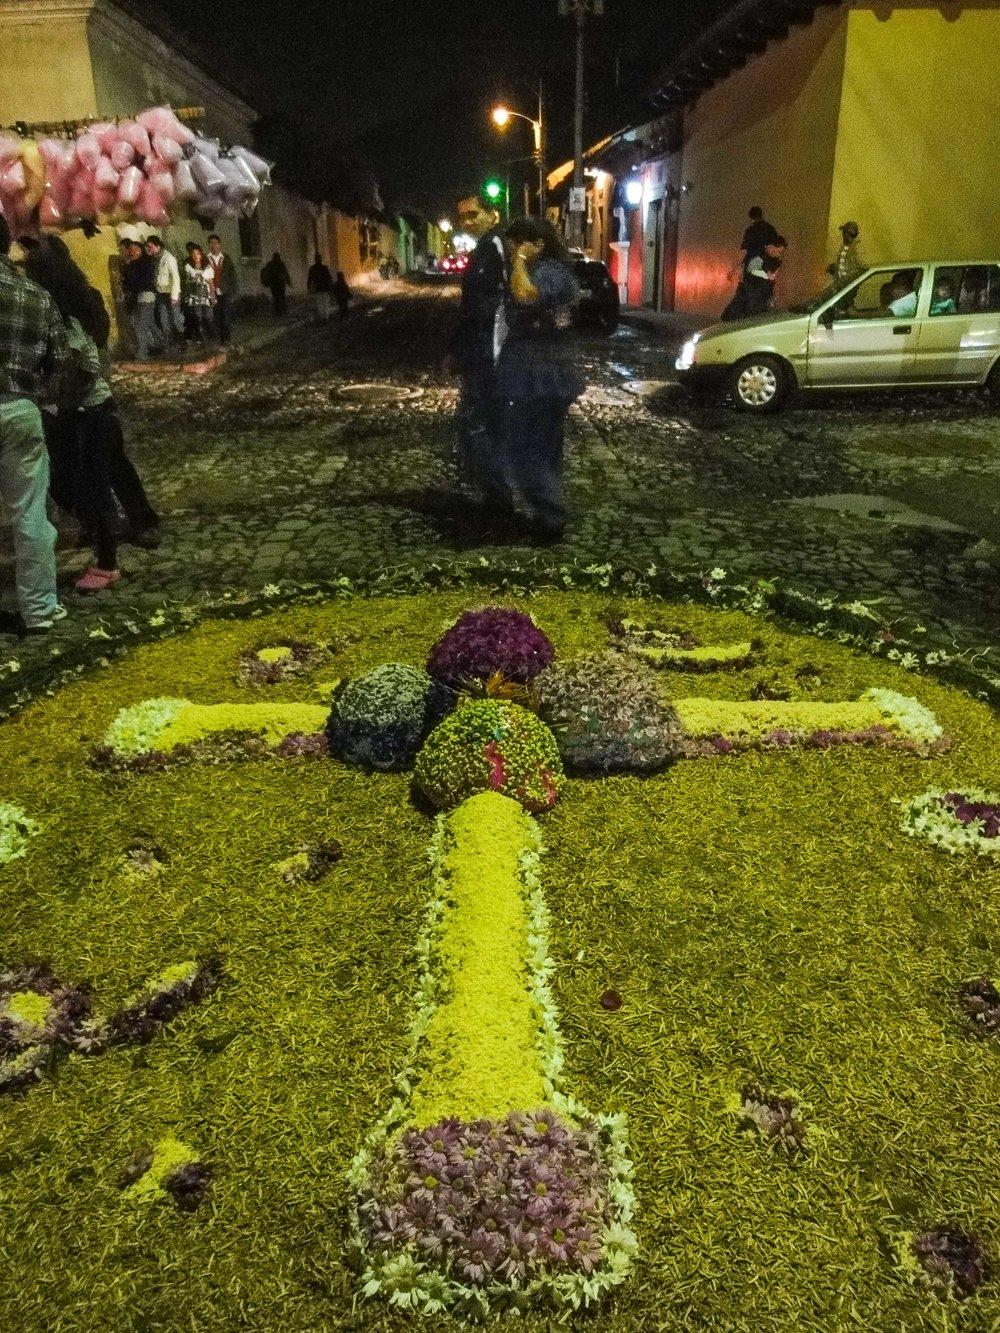 Semana Santa in Guatemala, Copyright Minu Chawla.